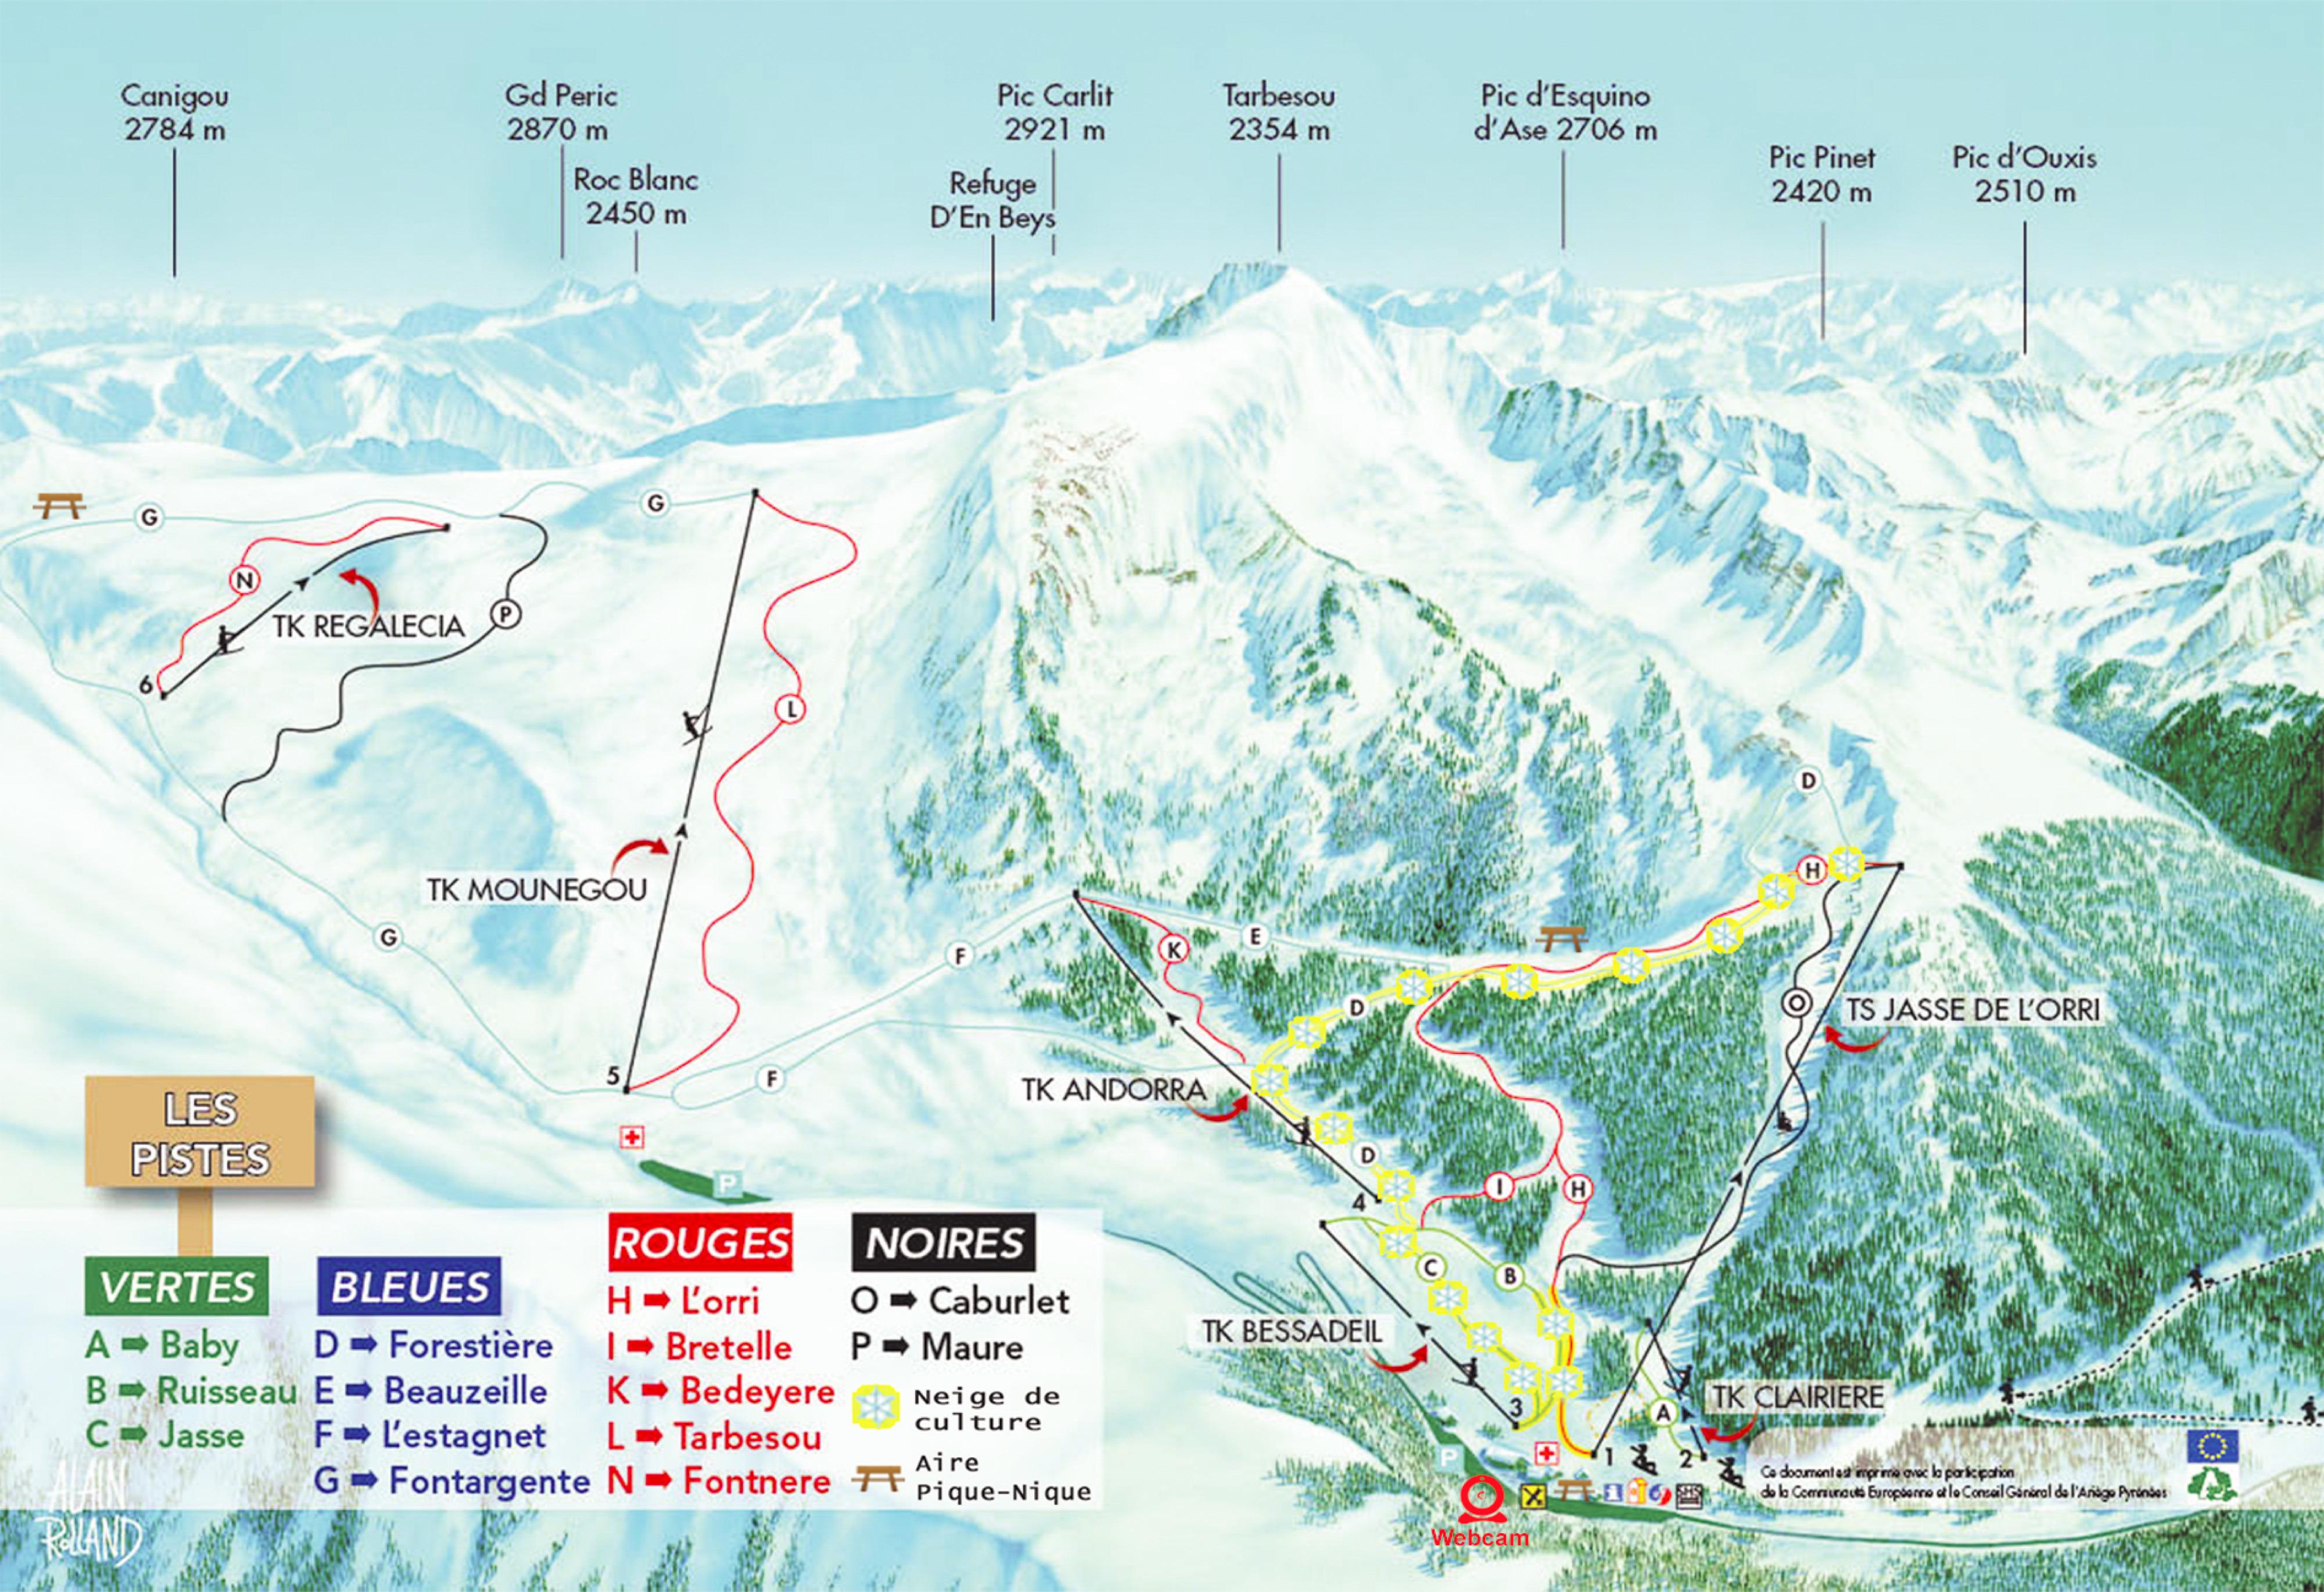 Ascou Pailhères Piste / Trail Map